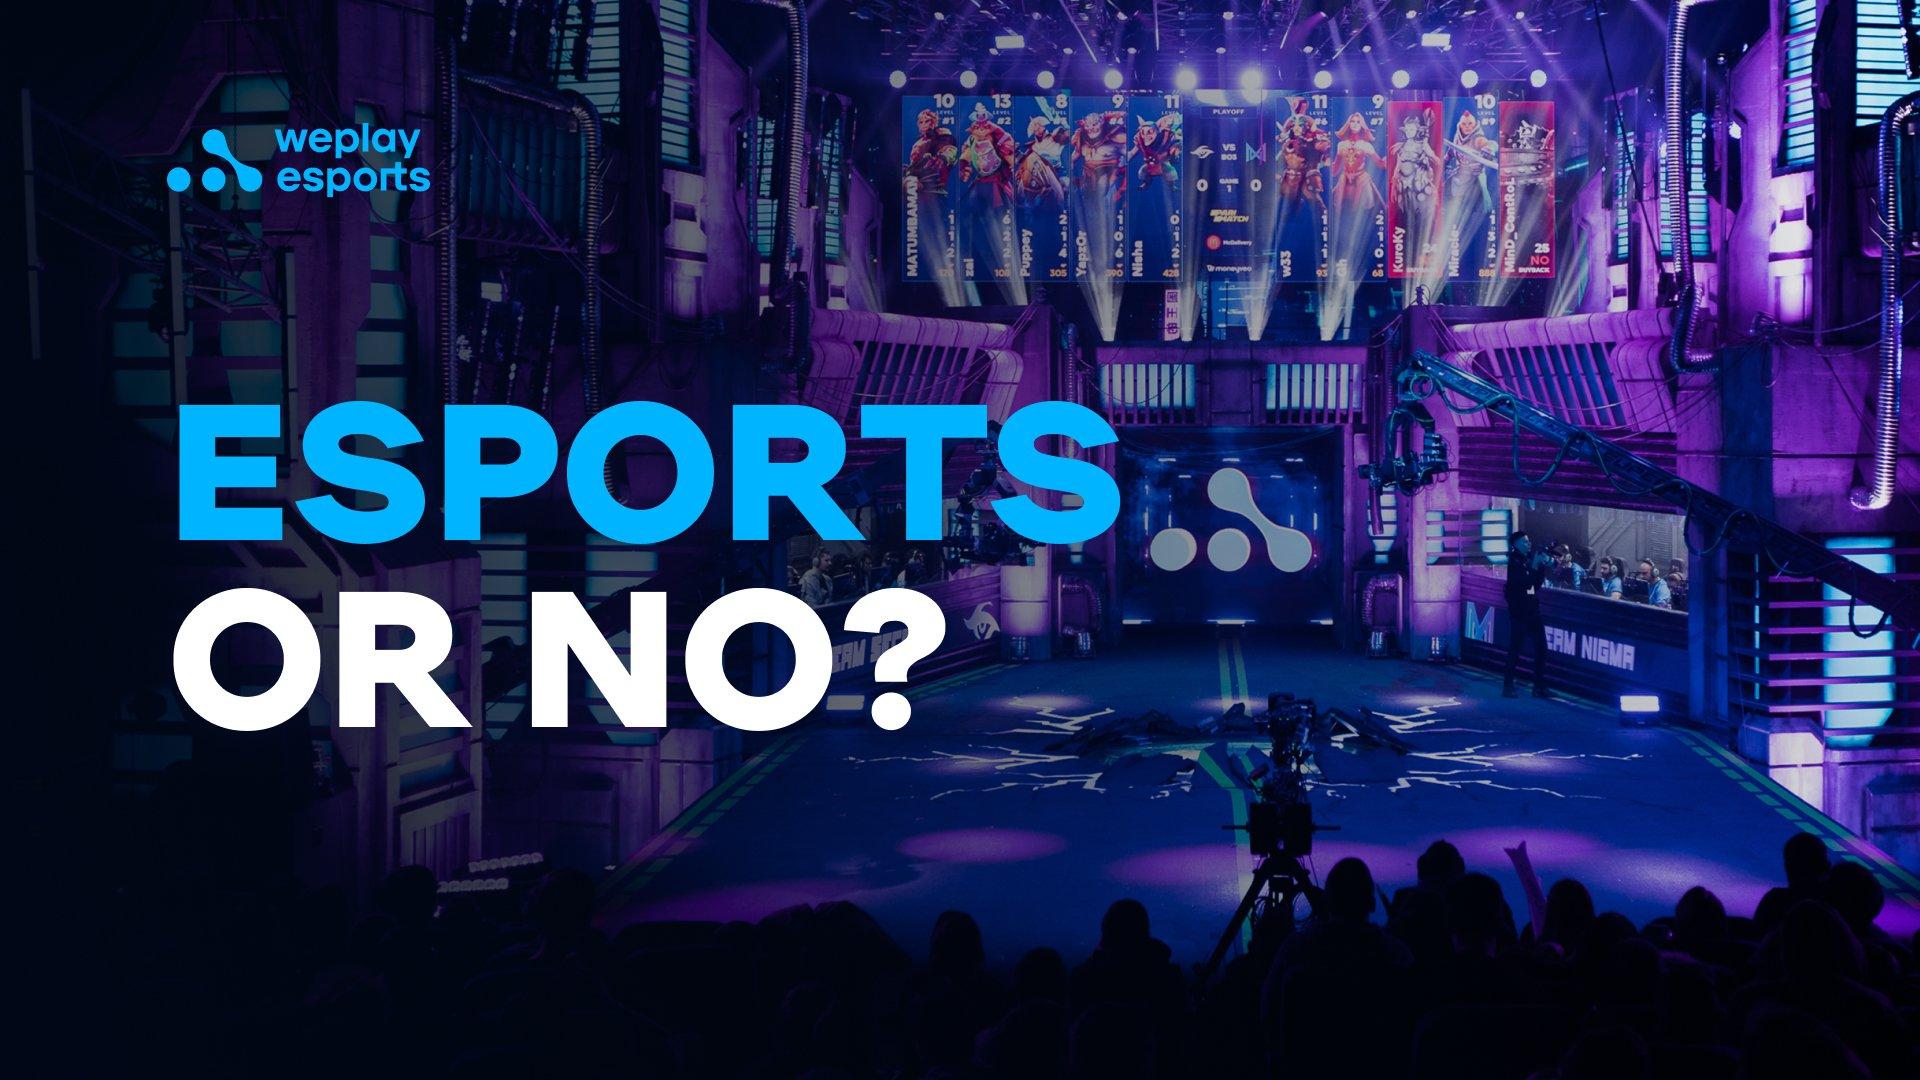 Esports or No?